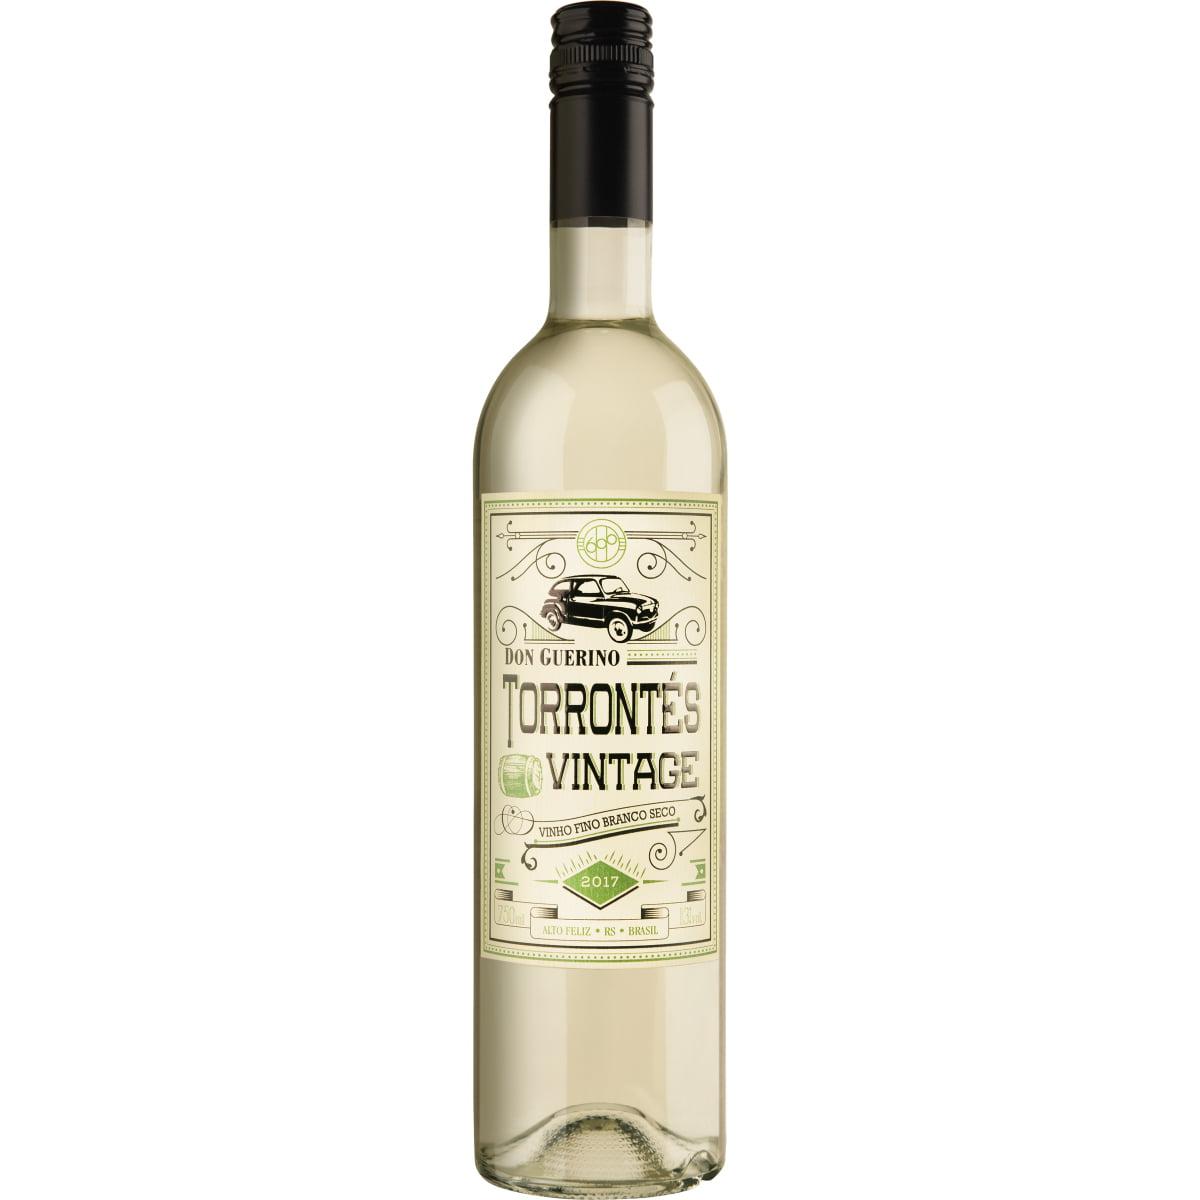 Vinho Don Guerino Vintage Torrontés Branco Seco 750ml